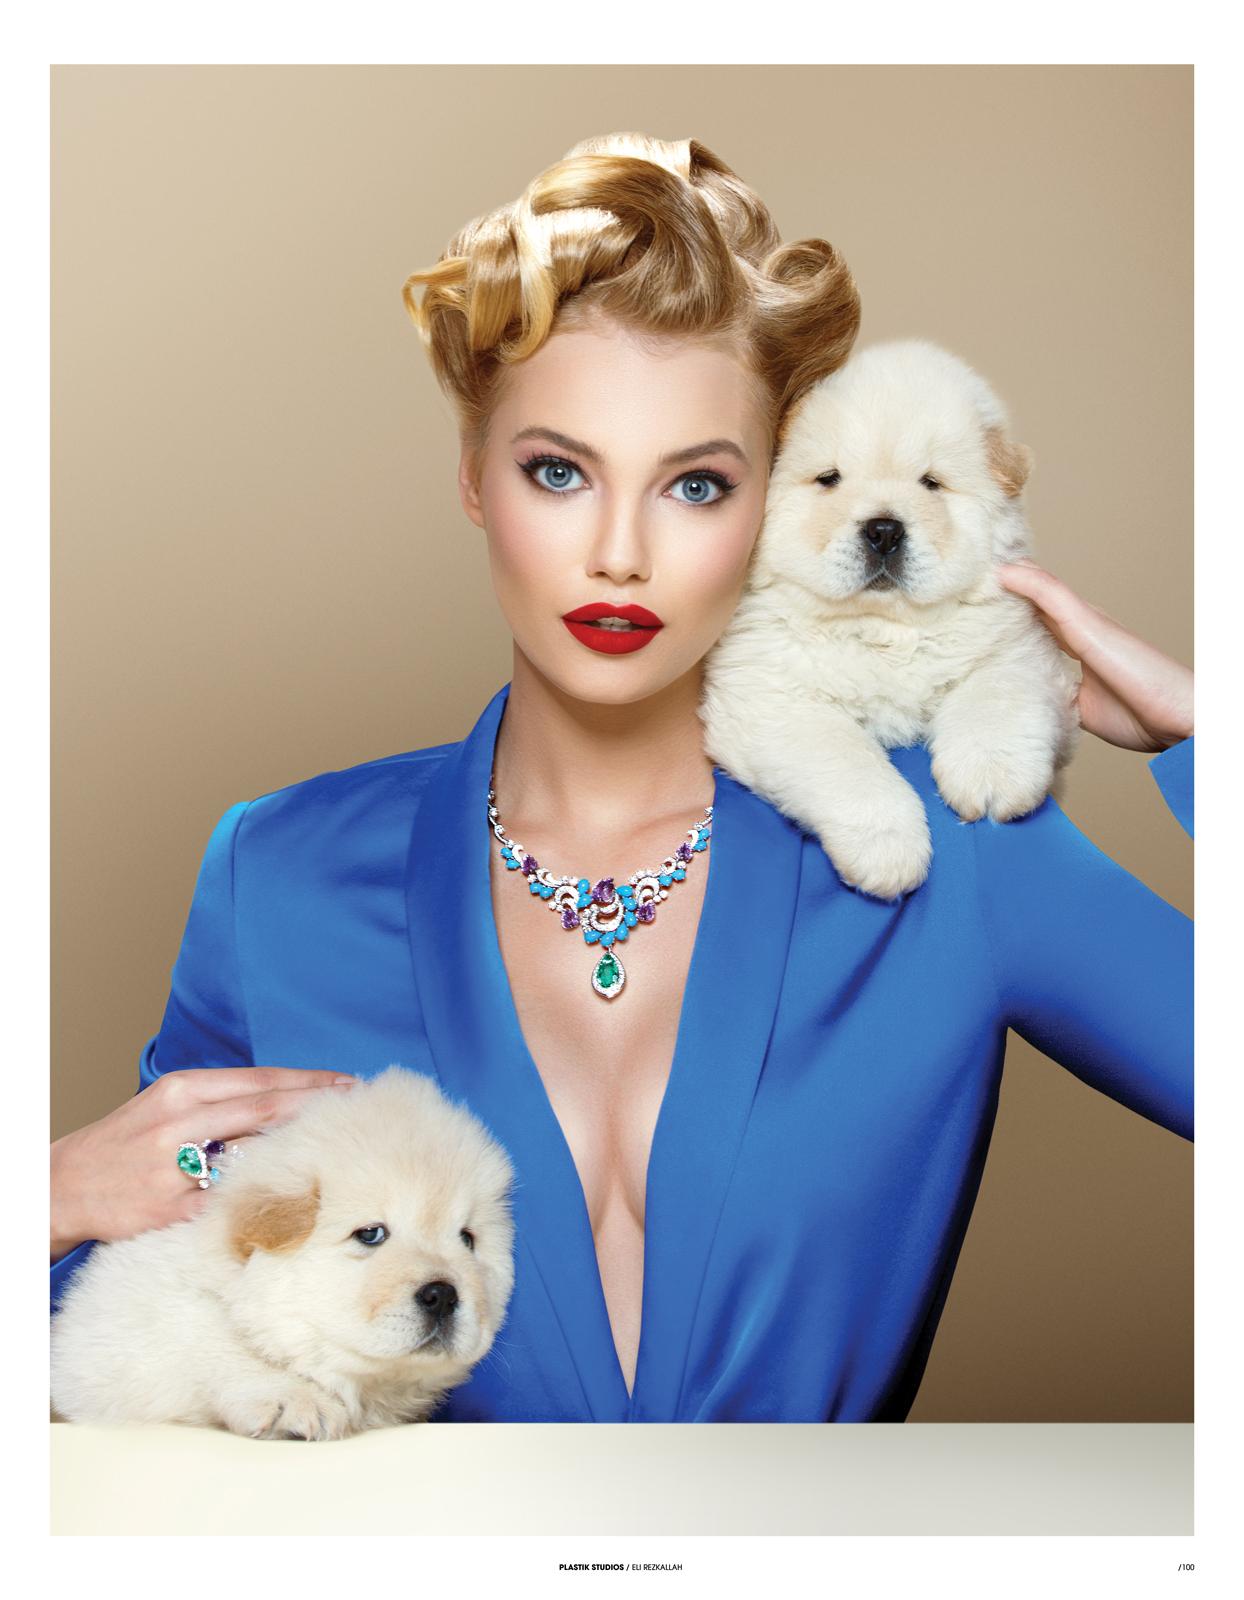 plastik magazine pets and diamonds puppy love